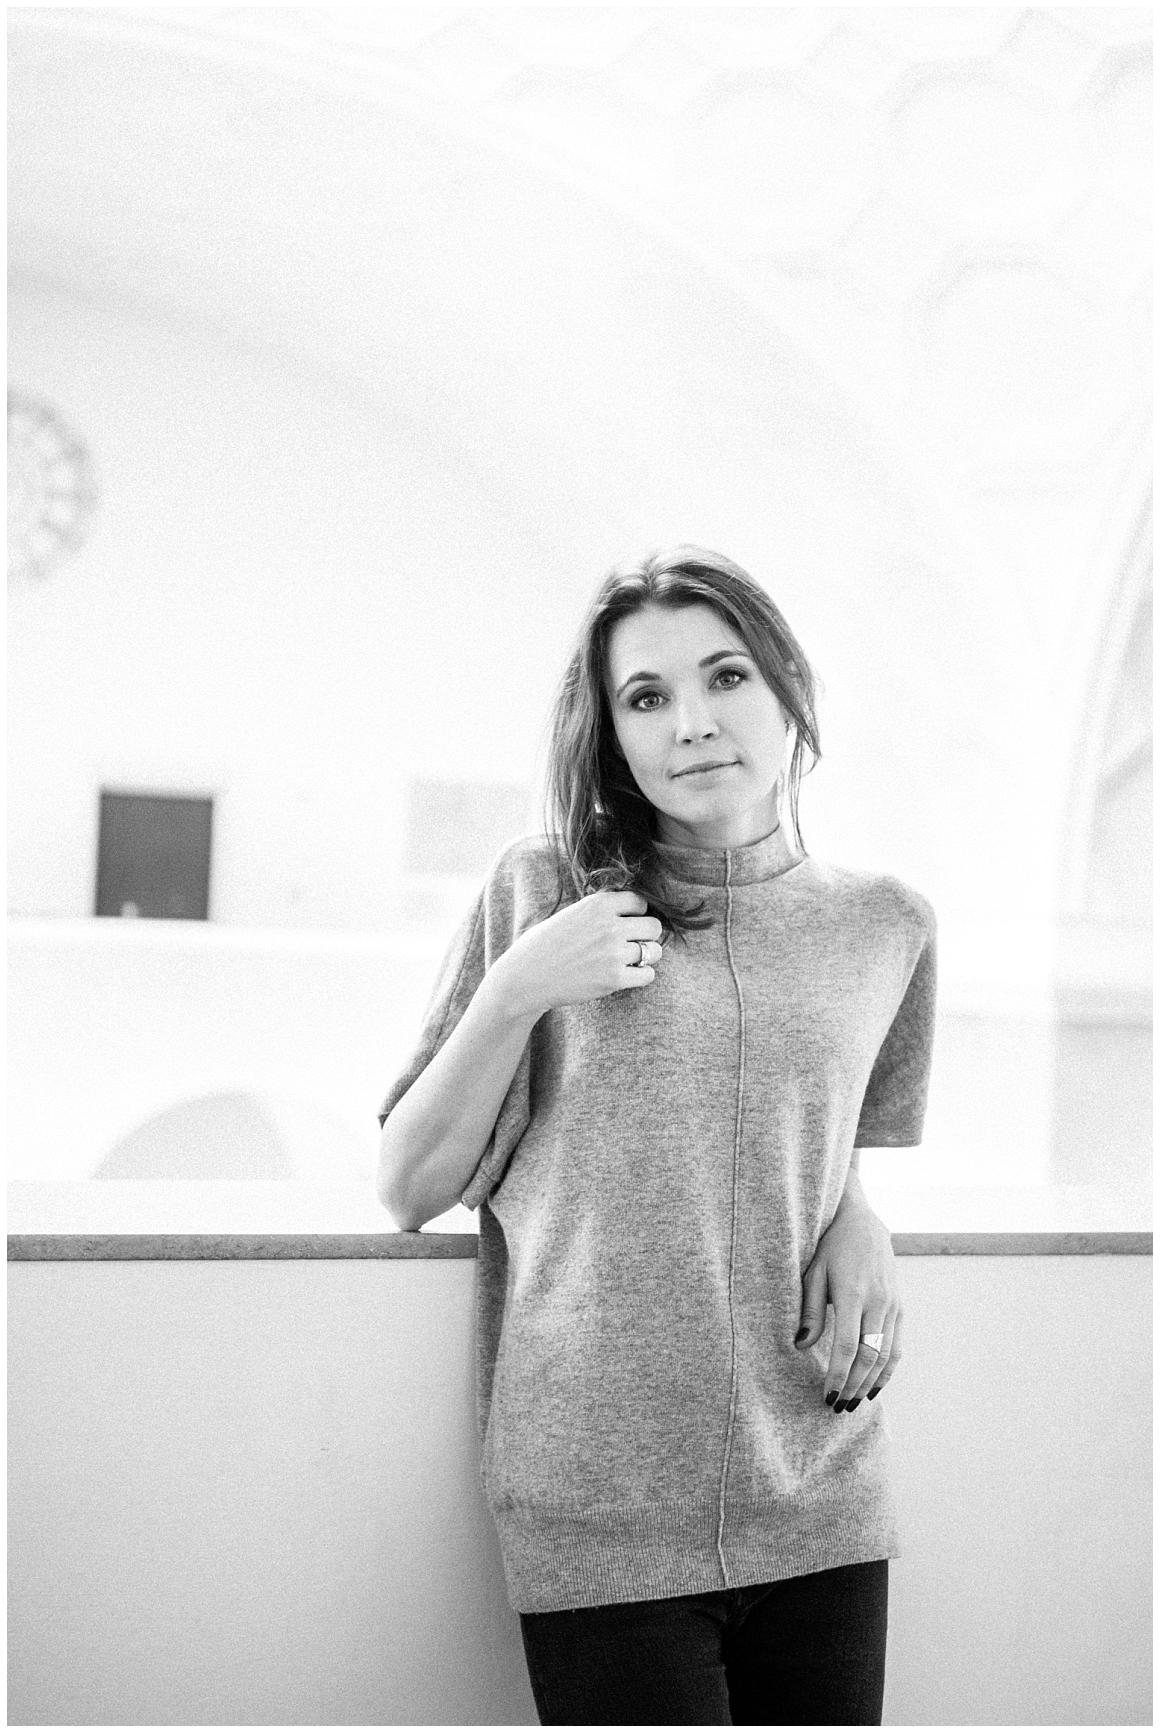 portrait-fotograf-münchen-rosenheim-natürliche-portraits-portraitfotos-katrin-kind_0013.jpg